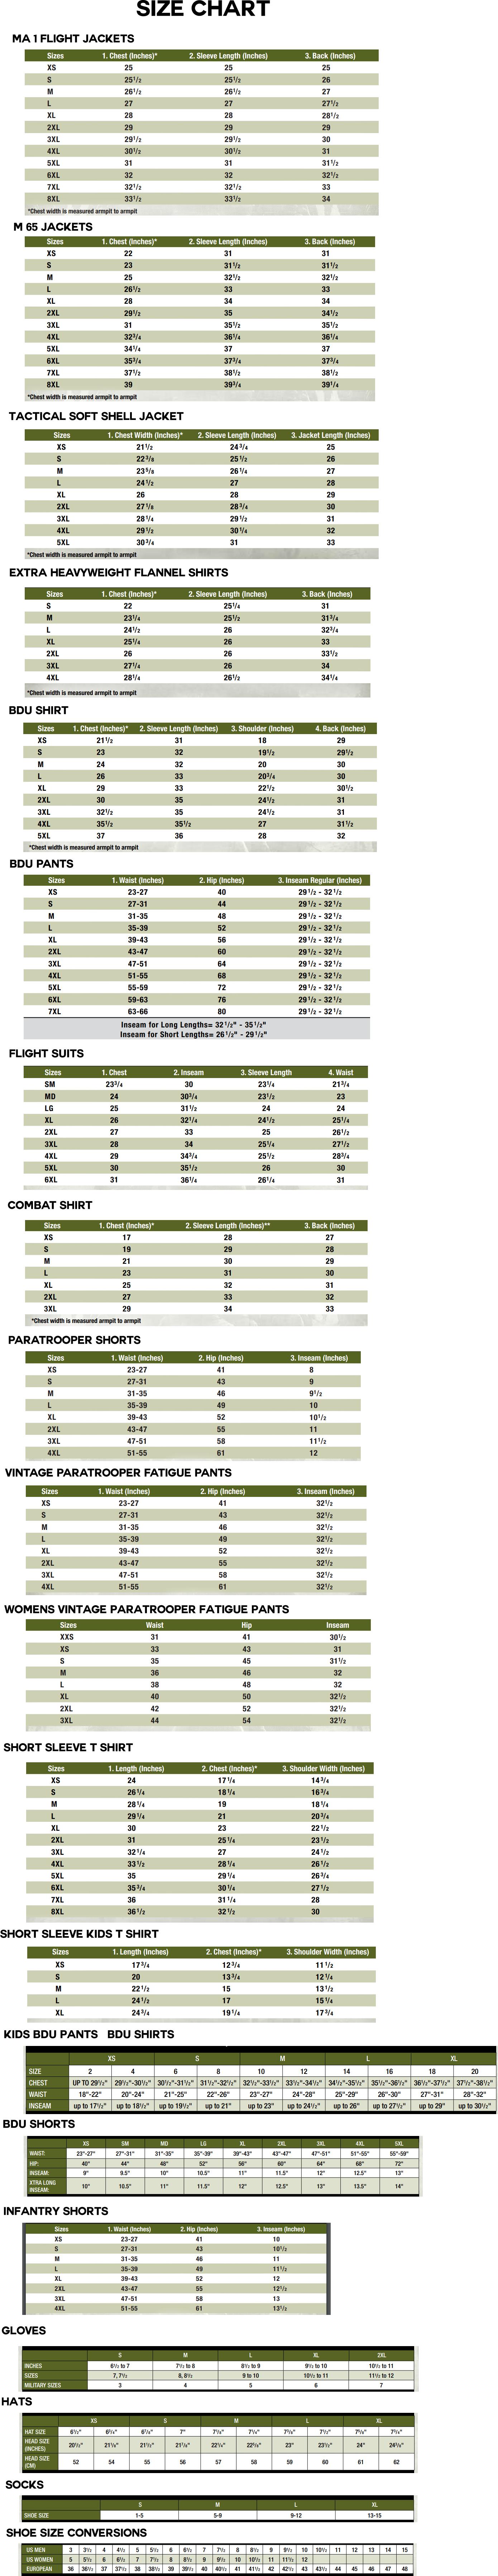 rothco-size-charts-master-group-image-1-.png